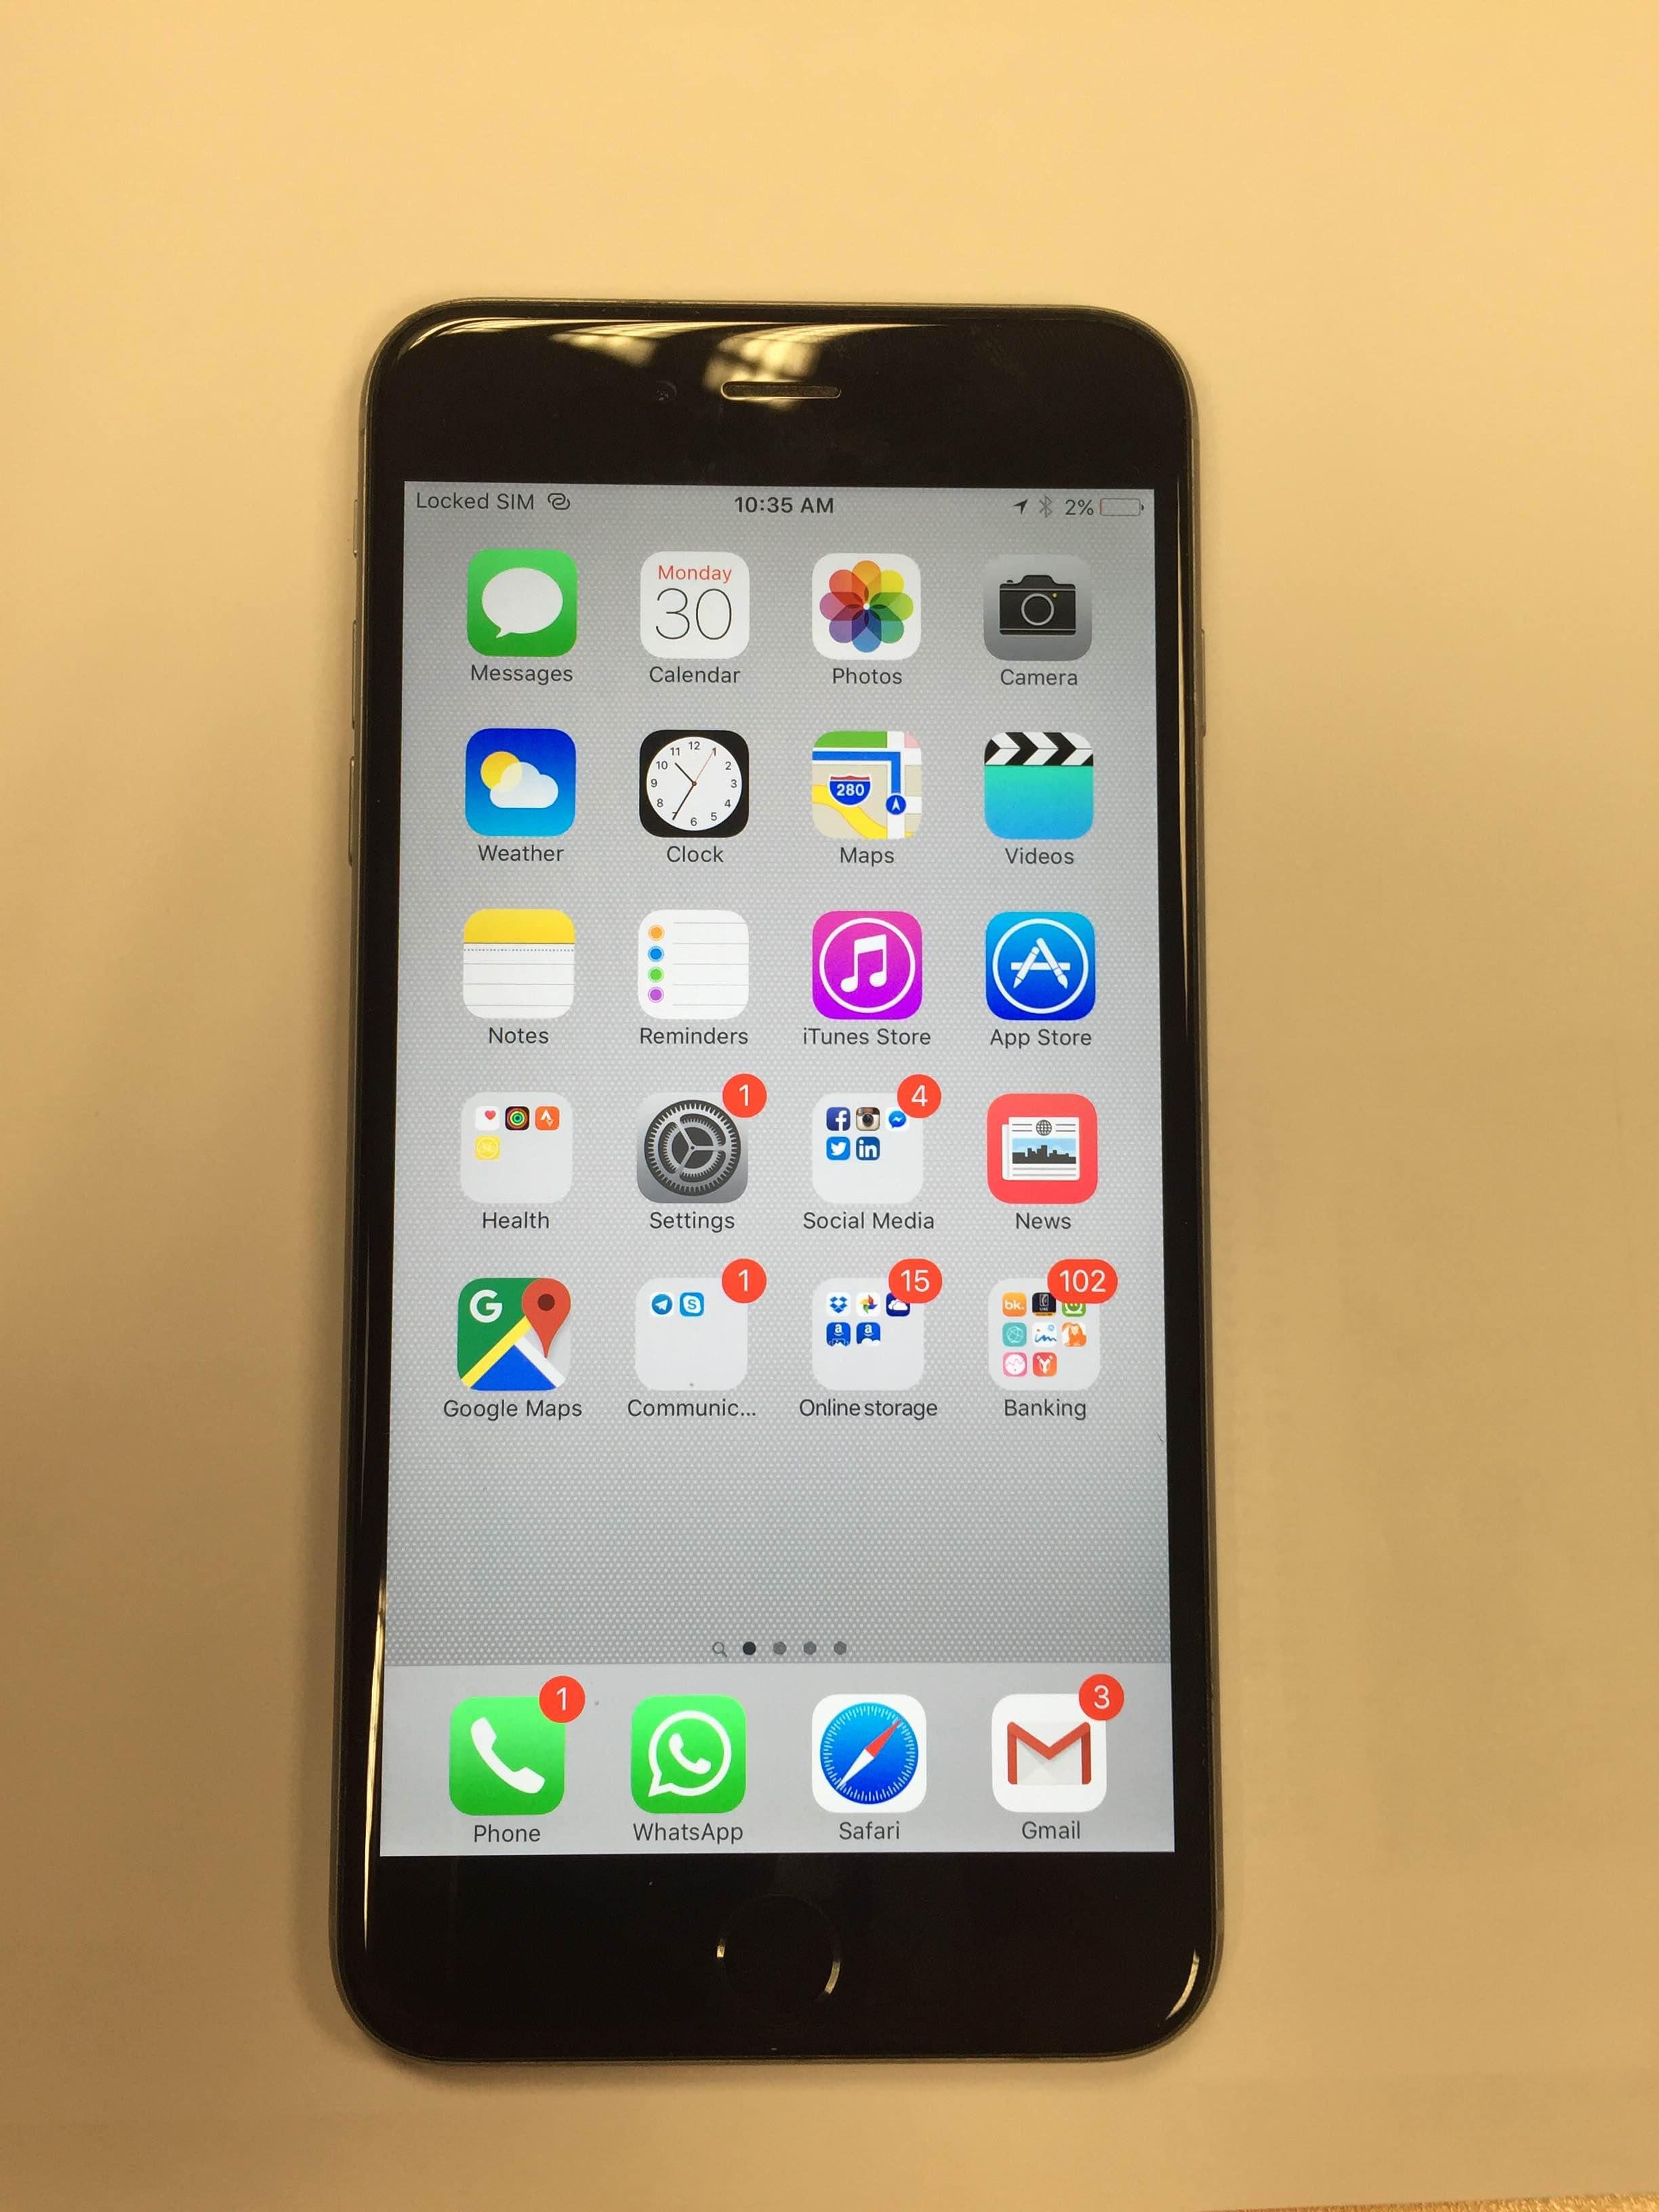 venta iphone 6 plus 64 gb gris espacial libre venta segunda mano apple. Black Bedroom Furniture Sets. Home Design Ideas